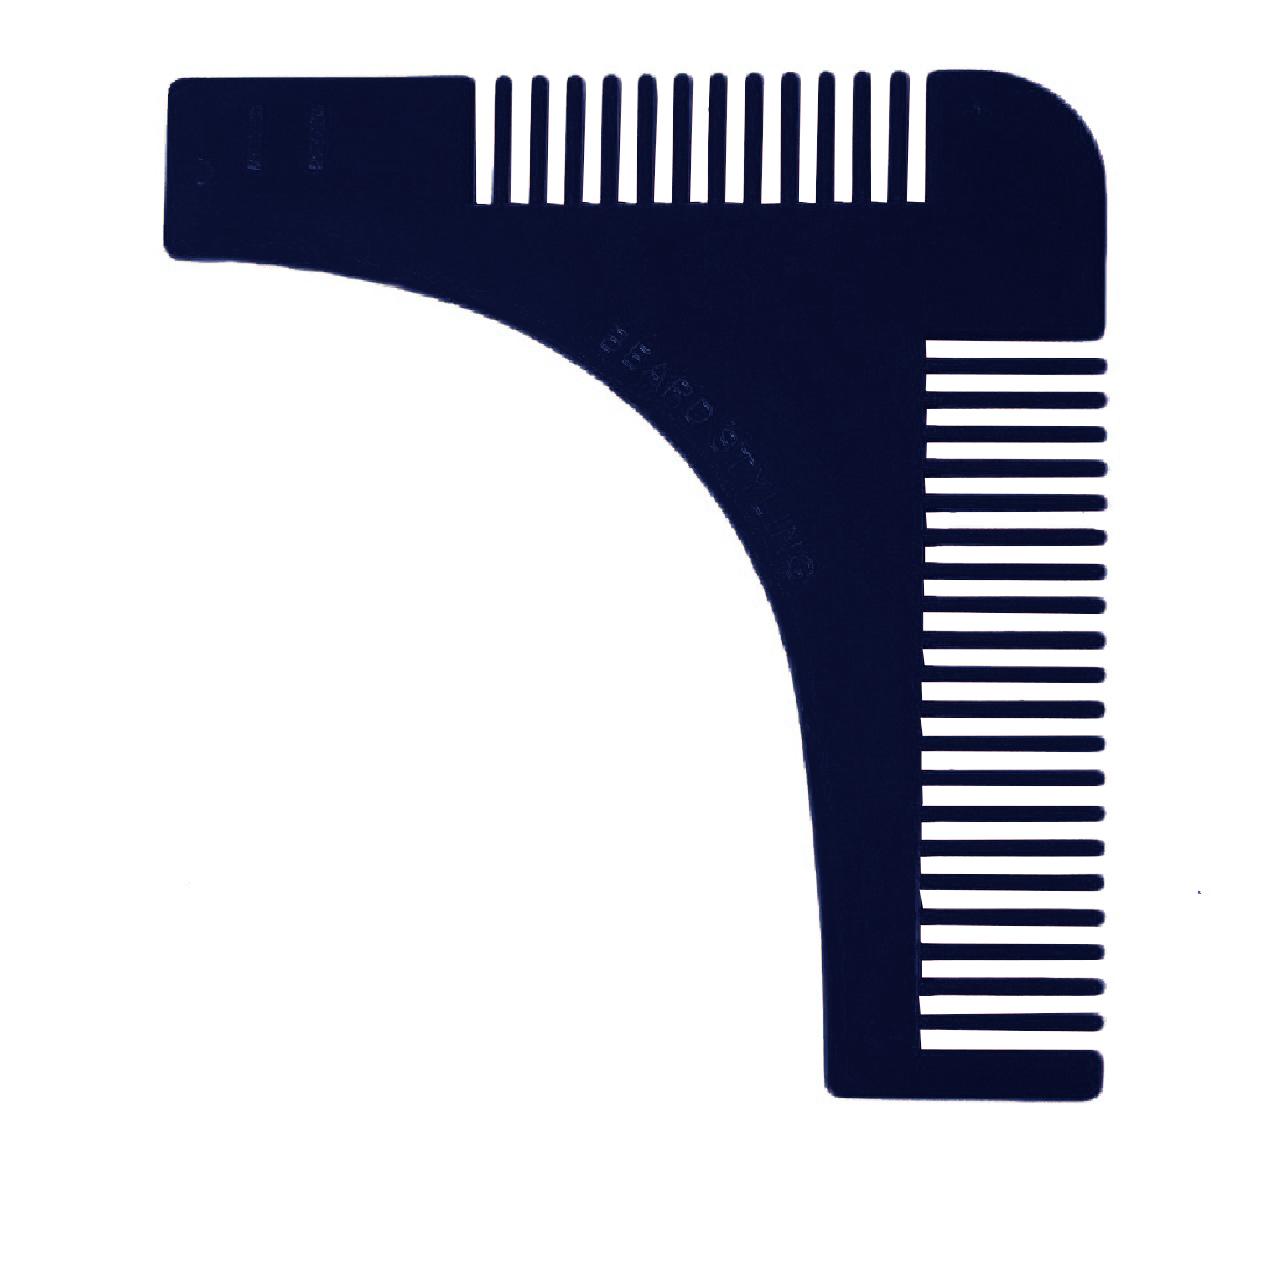 شانه اصلاح ریش مدل Beard Styling